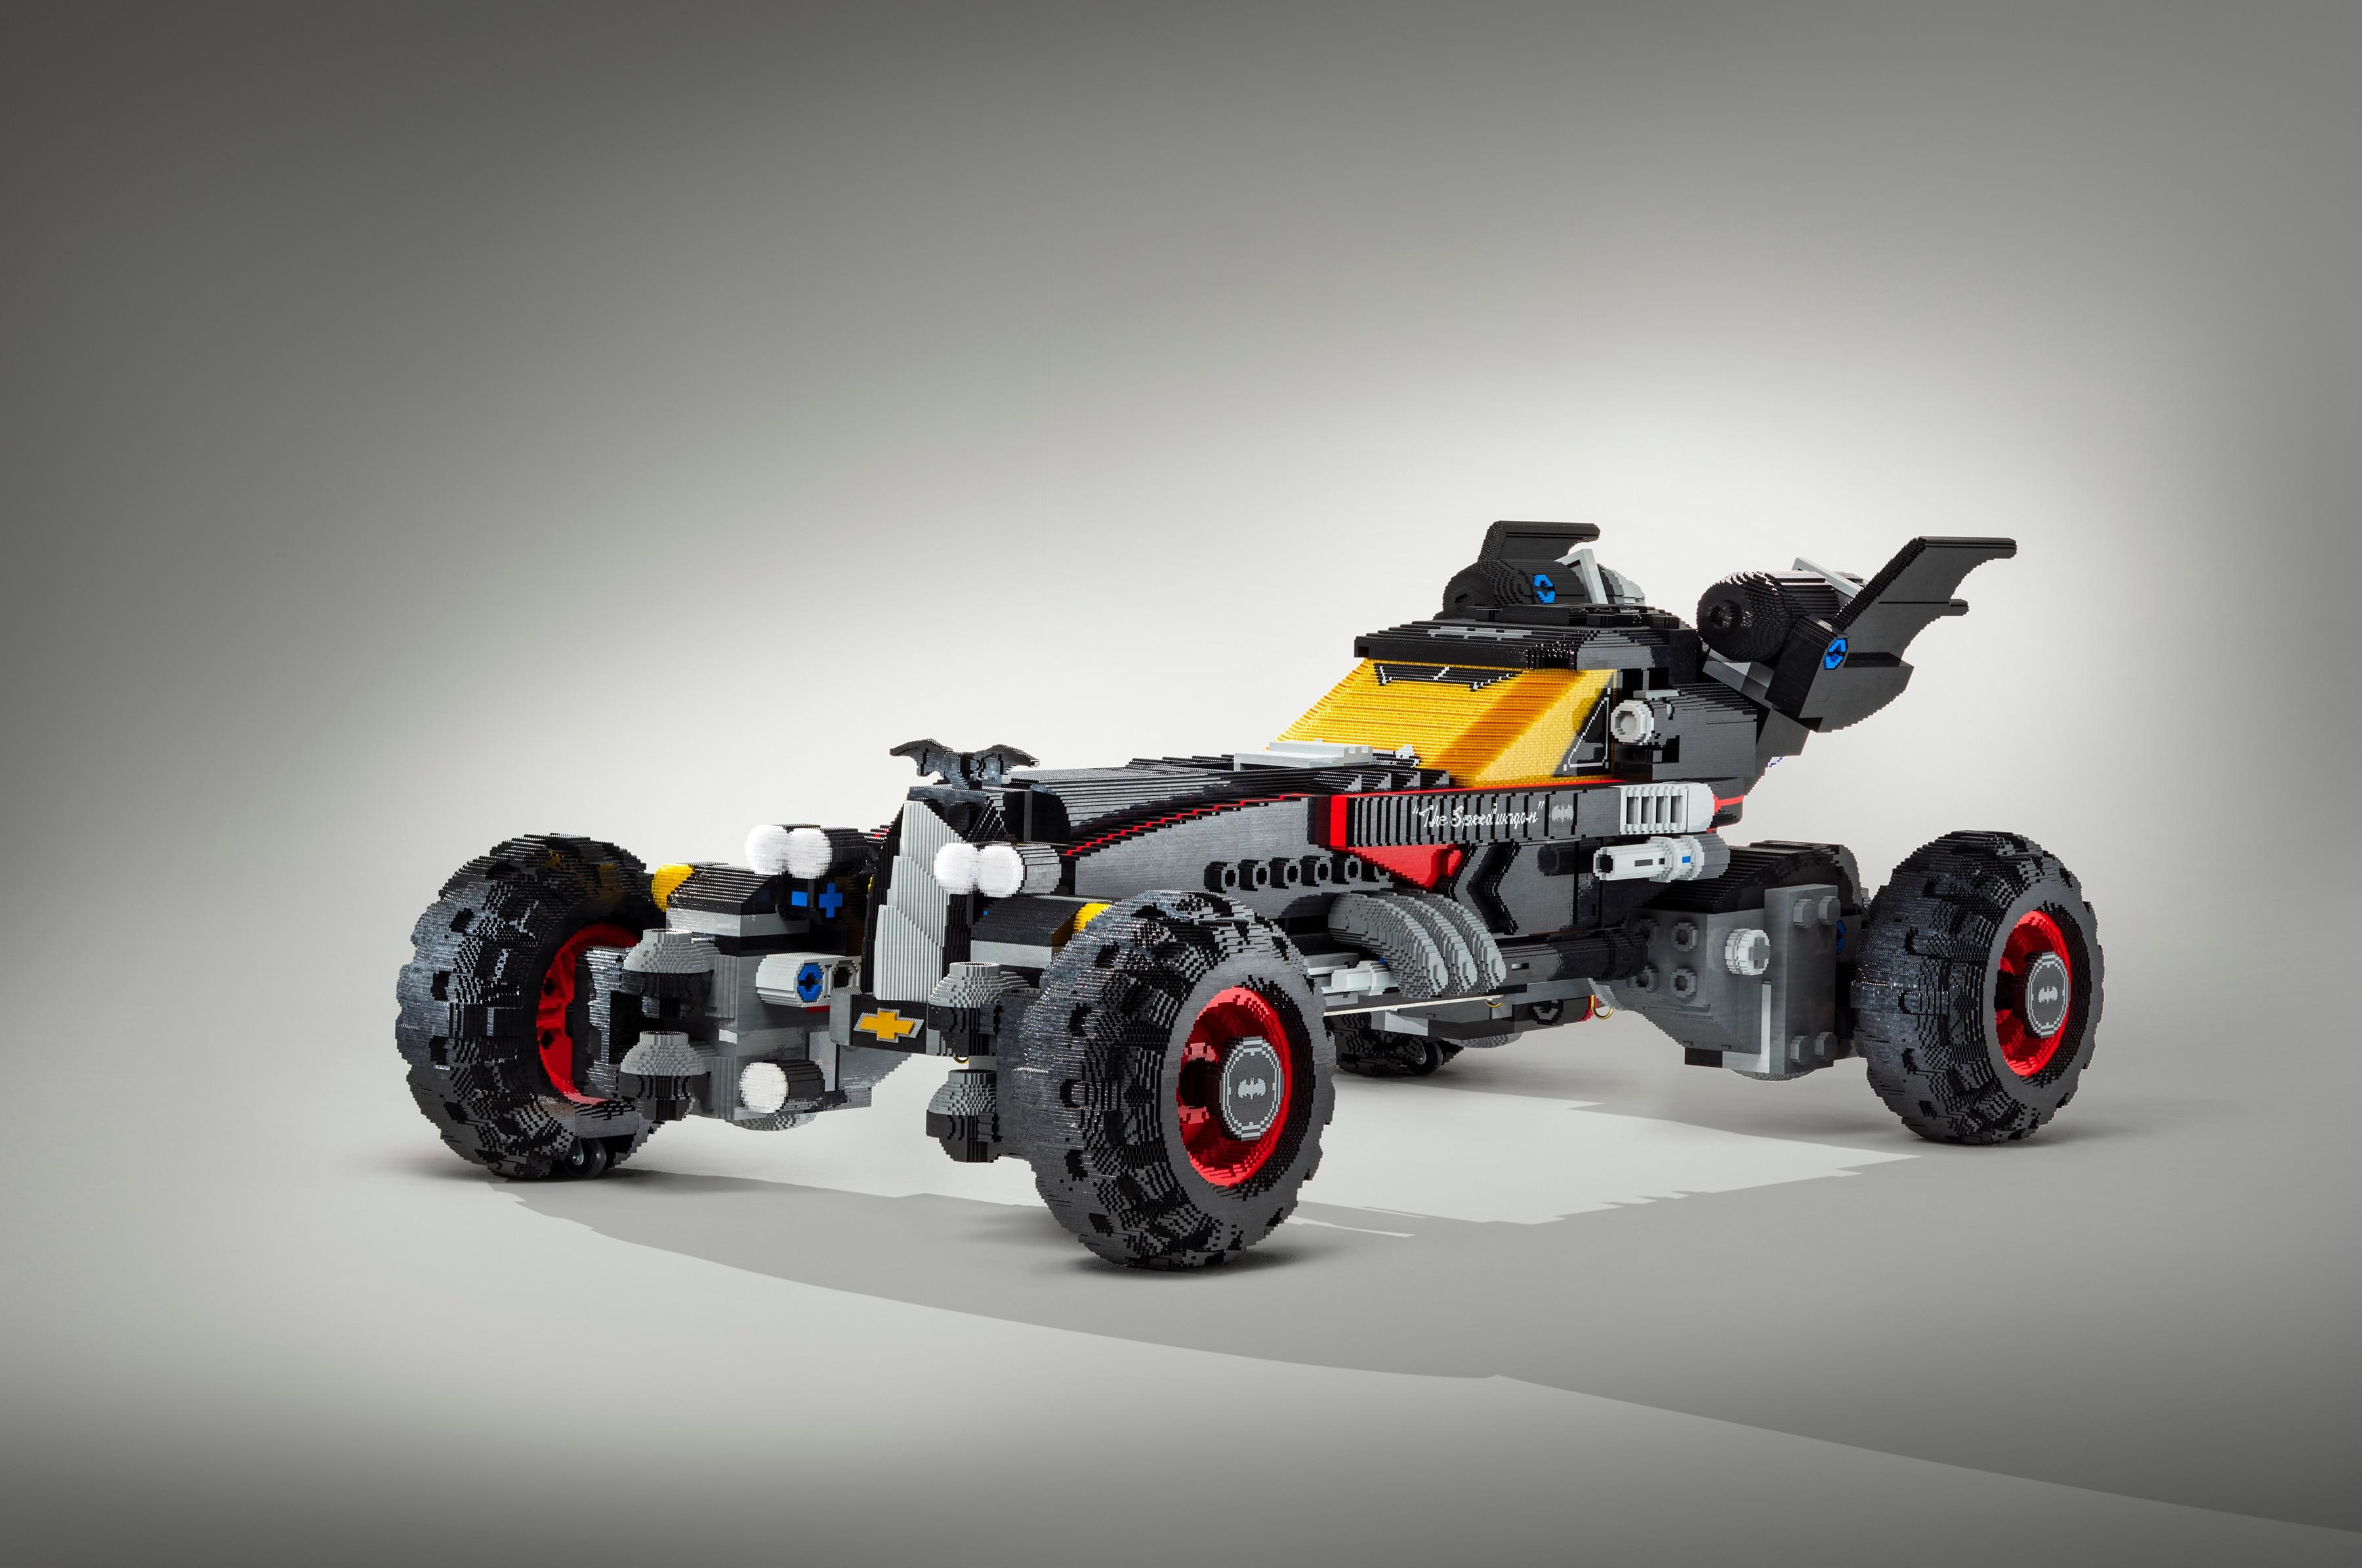 Chevrolet Introduces Life-Sized Lego Batmobile at Detroit Auto Show